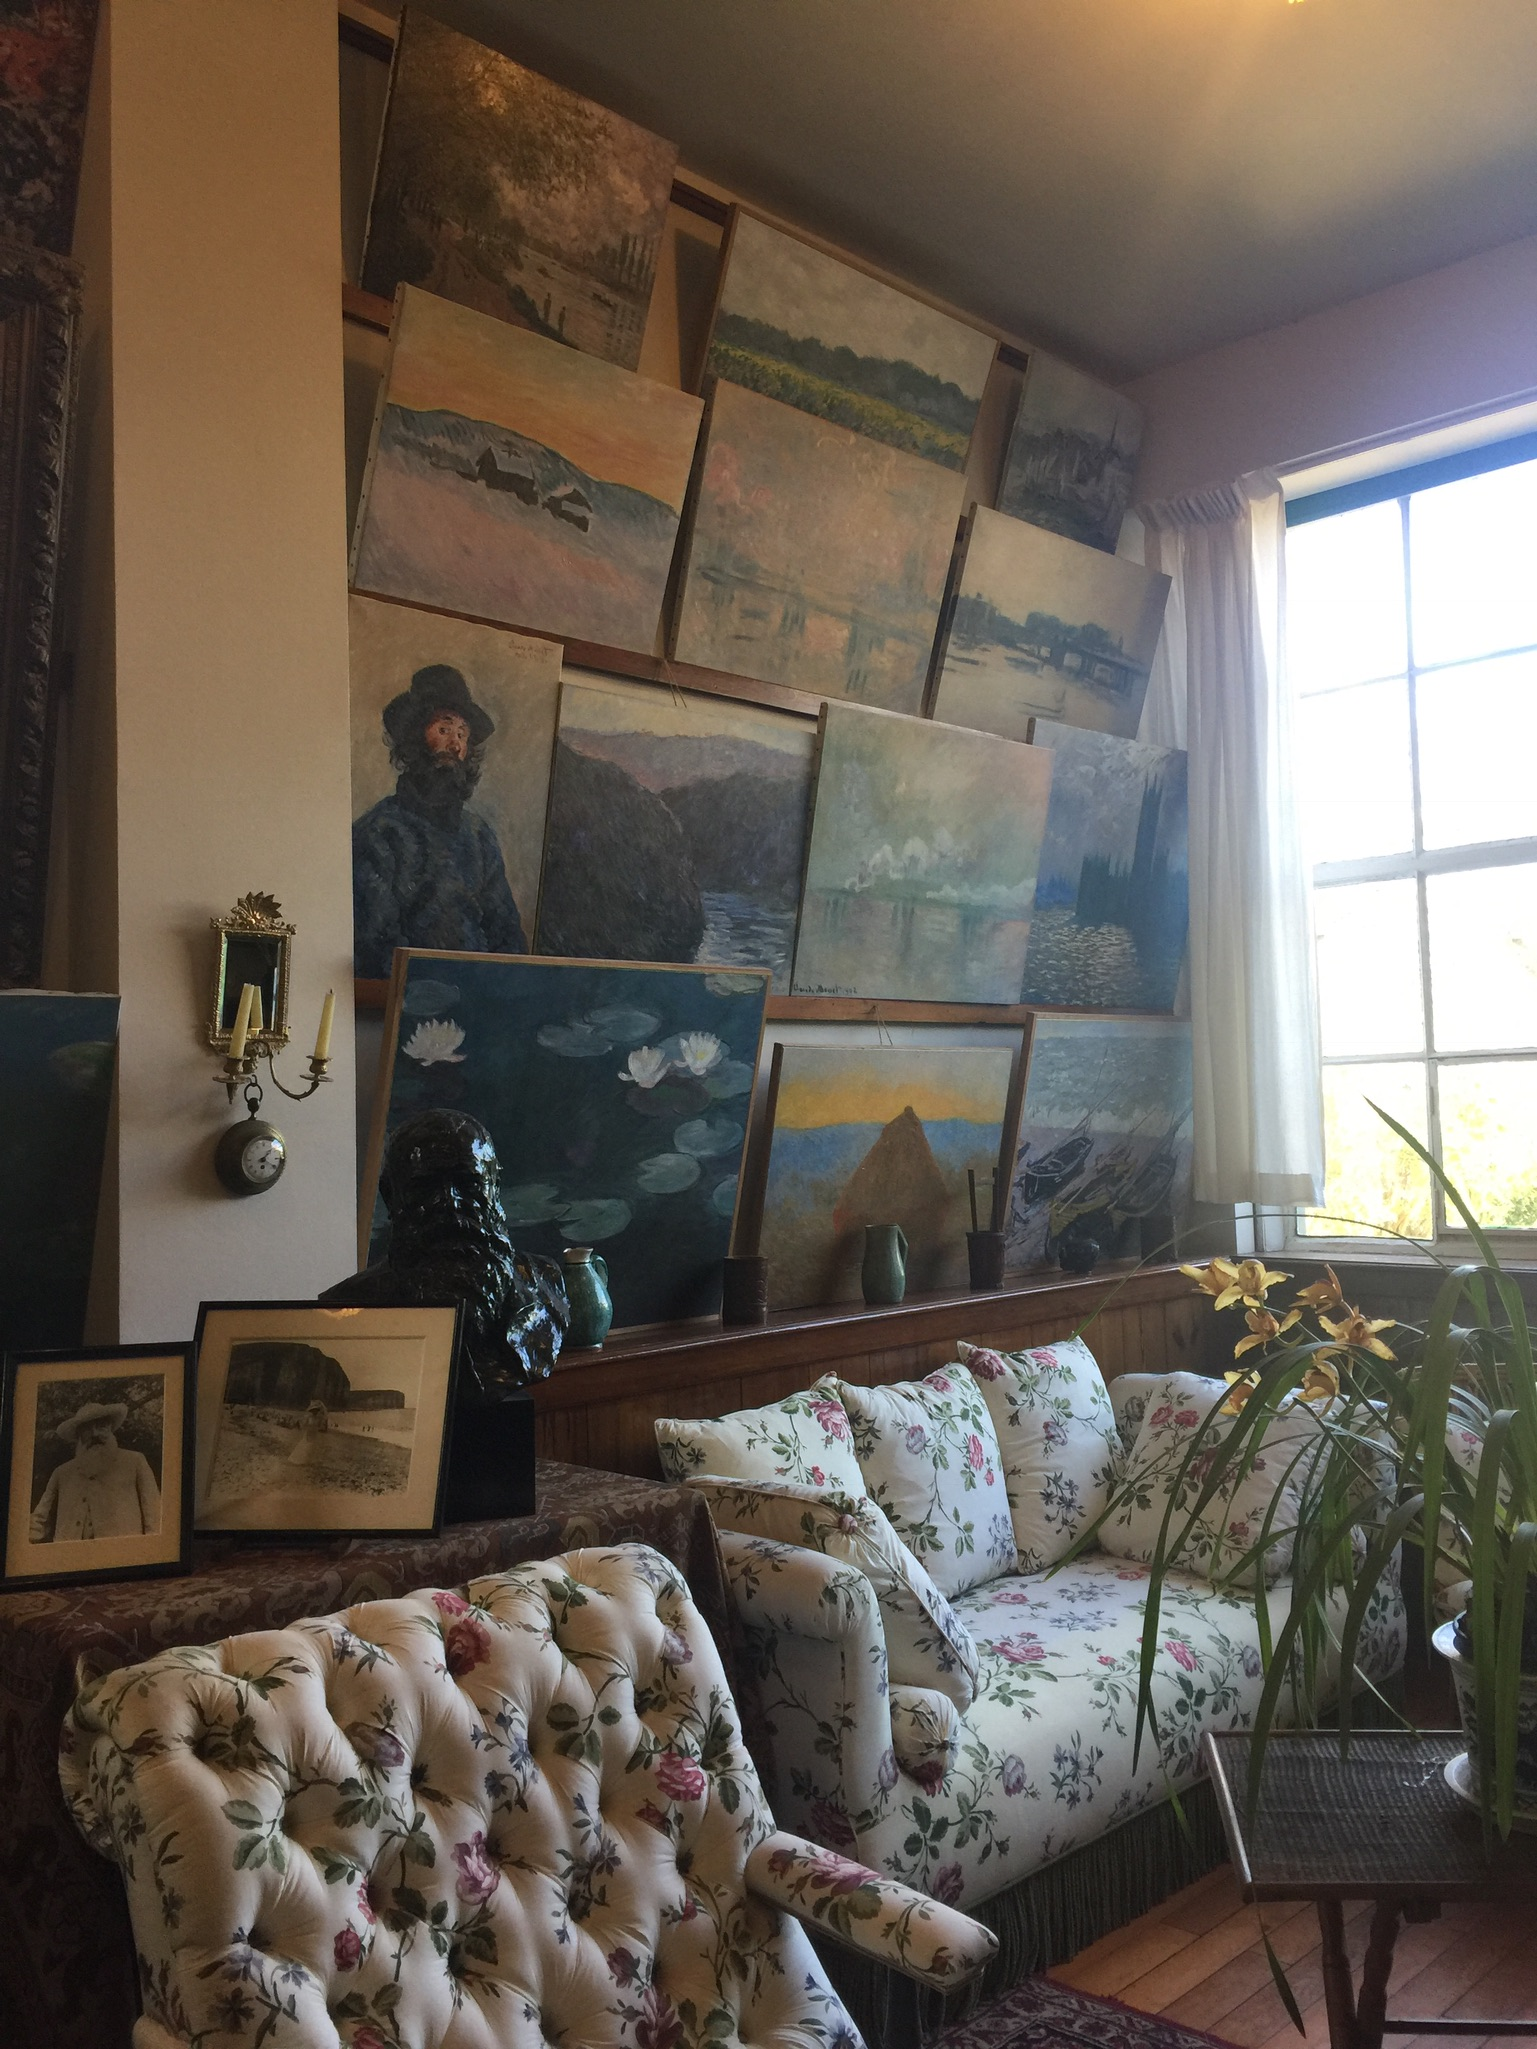 Monet's home studio with replica paintings